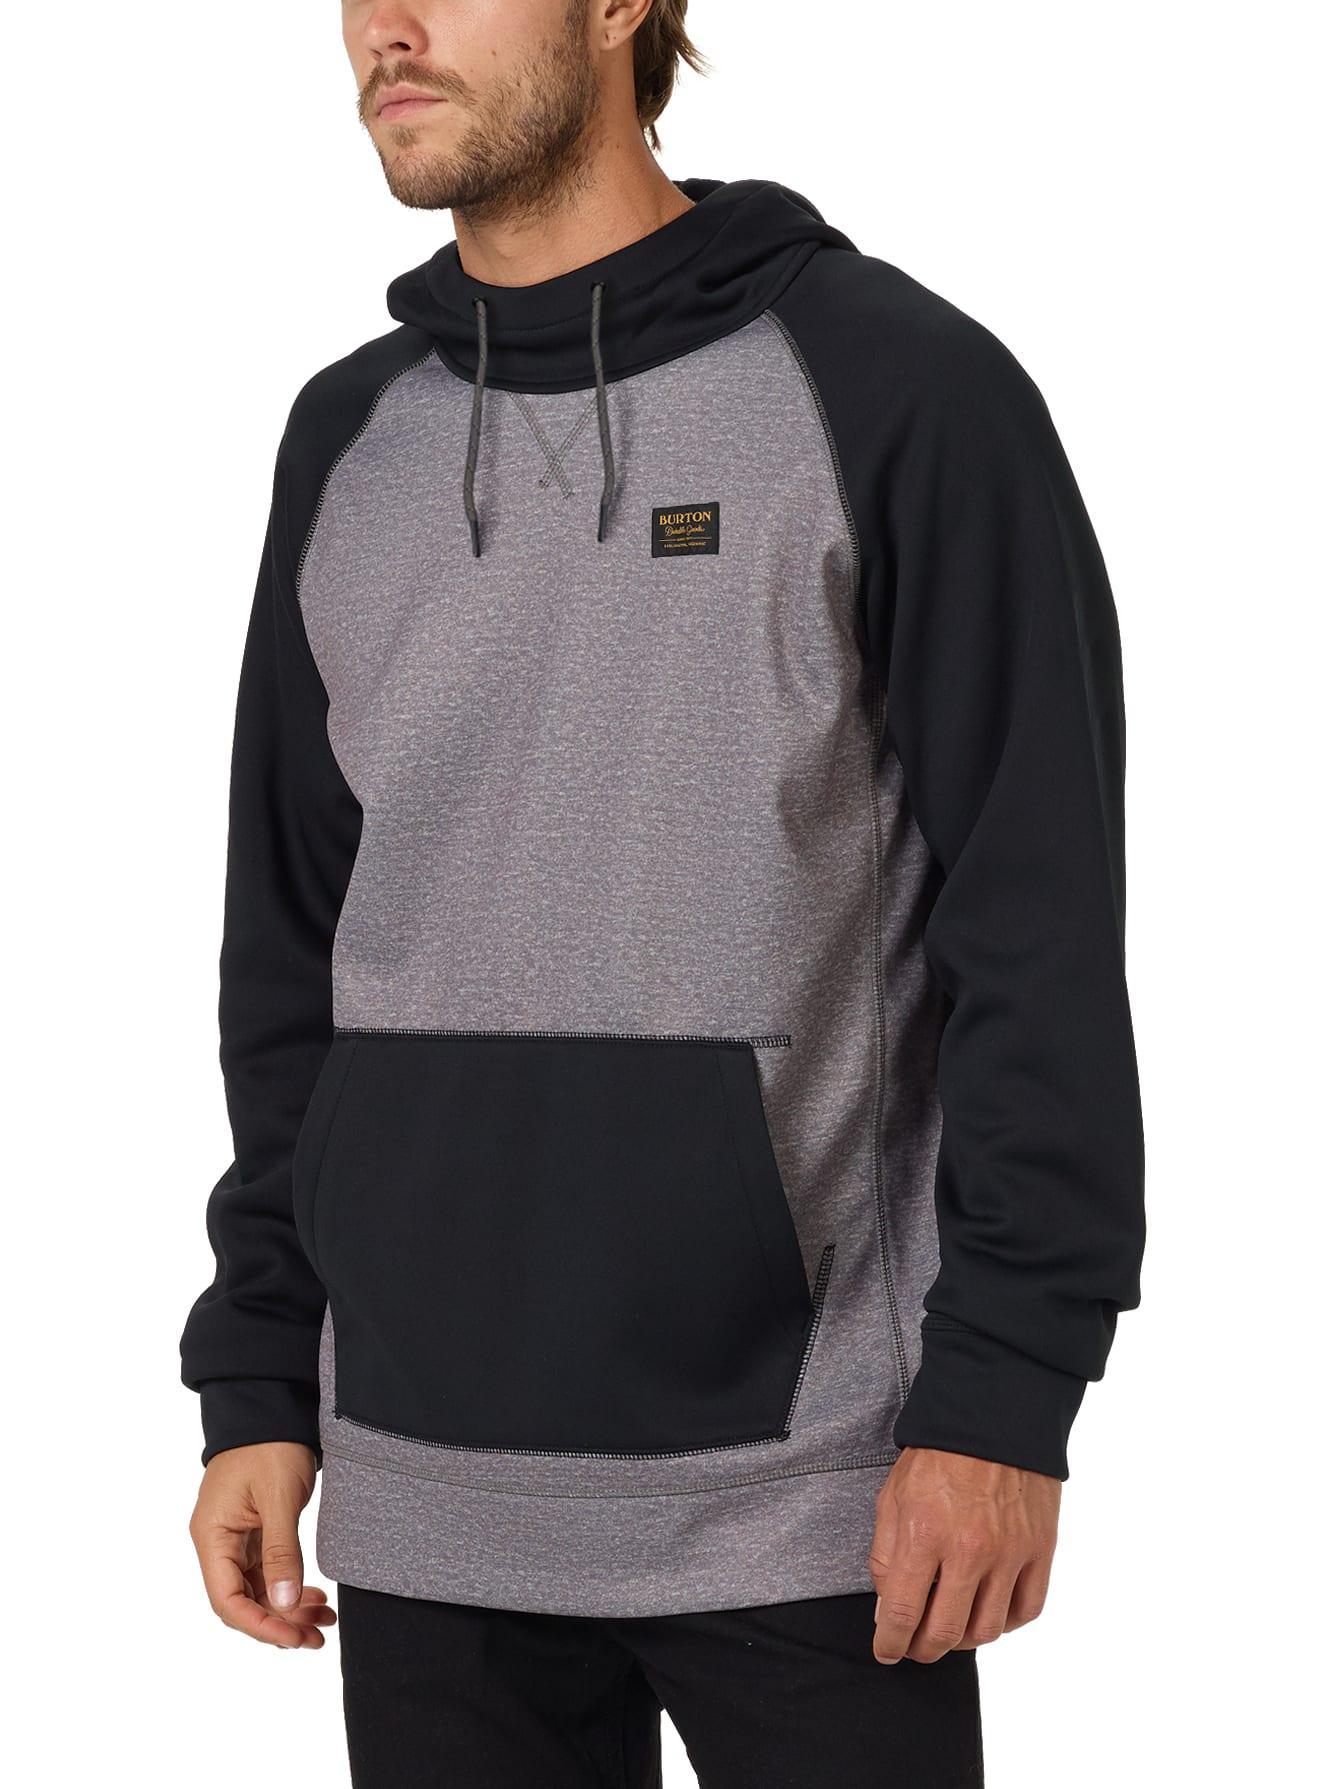 outfitting travis wish image burton preparation list hoodie safari all rice sleeper backpacks